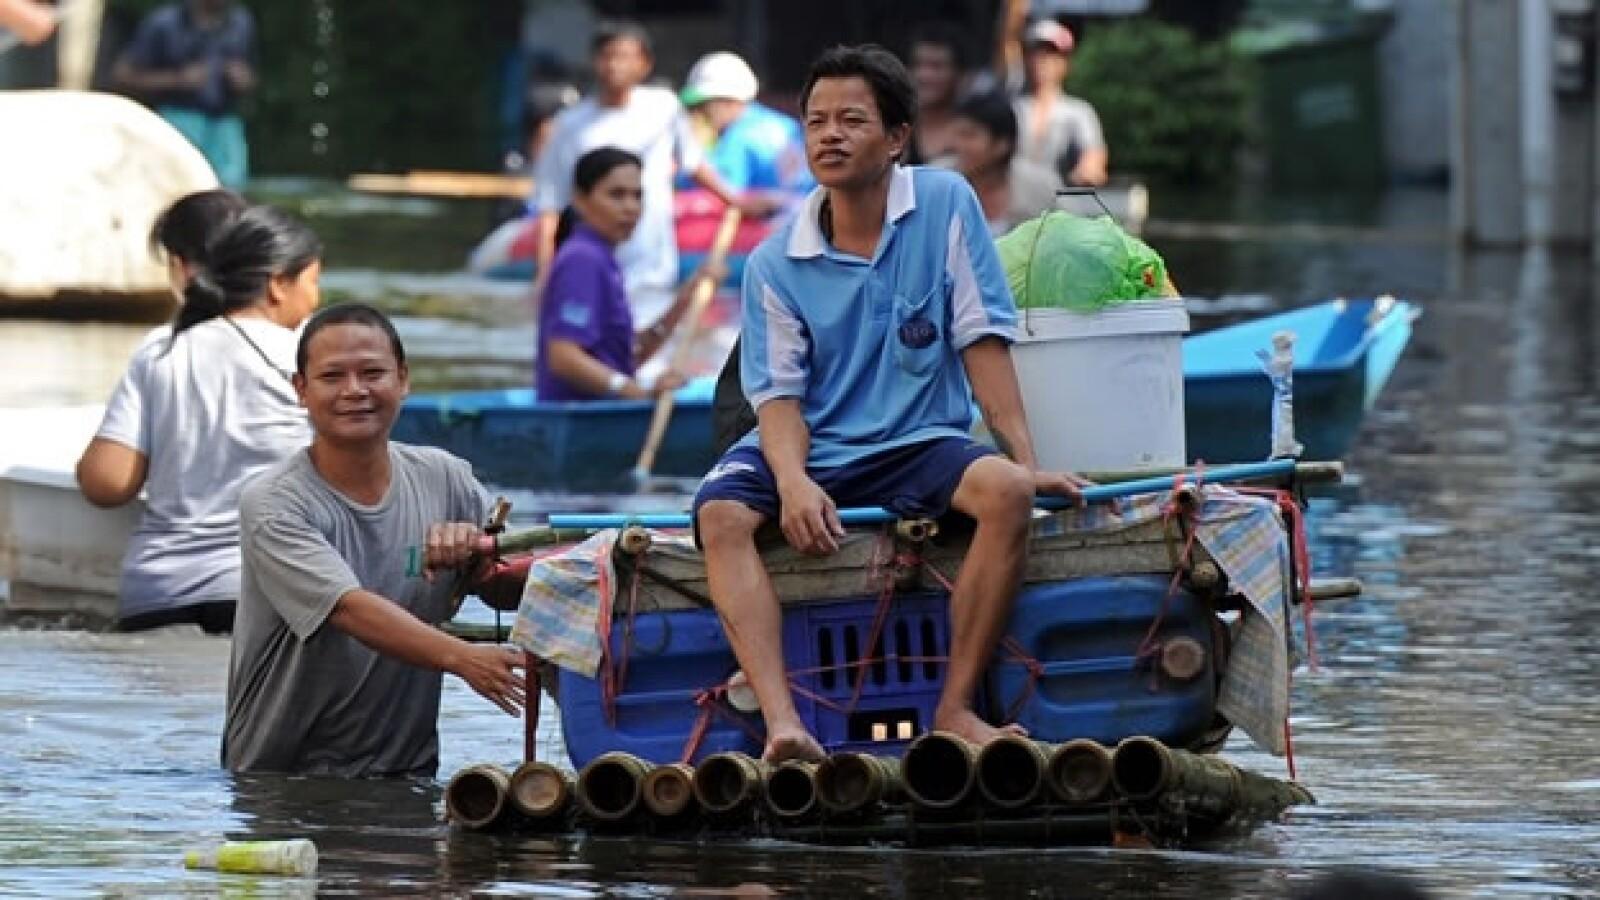 bangkok tailandia inundaciones 09